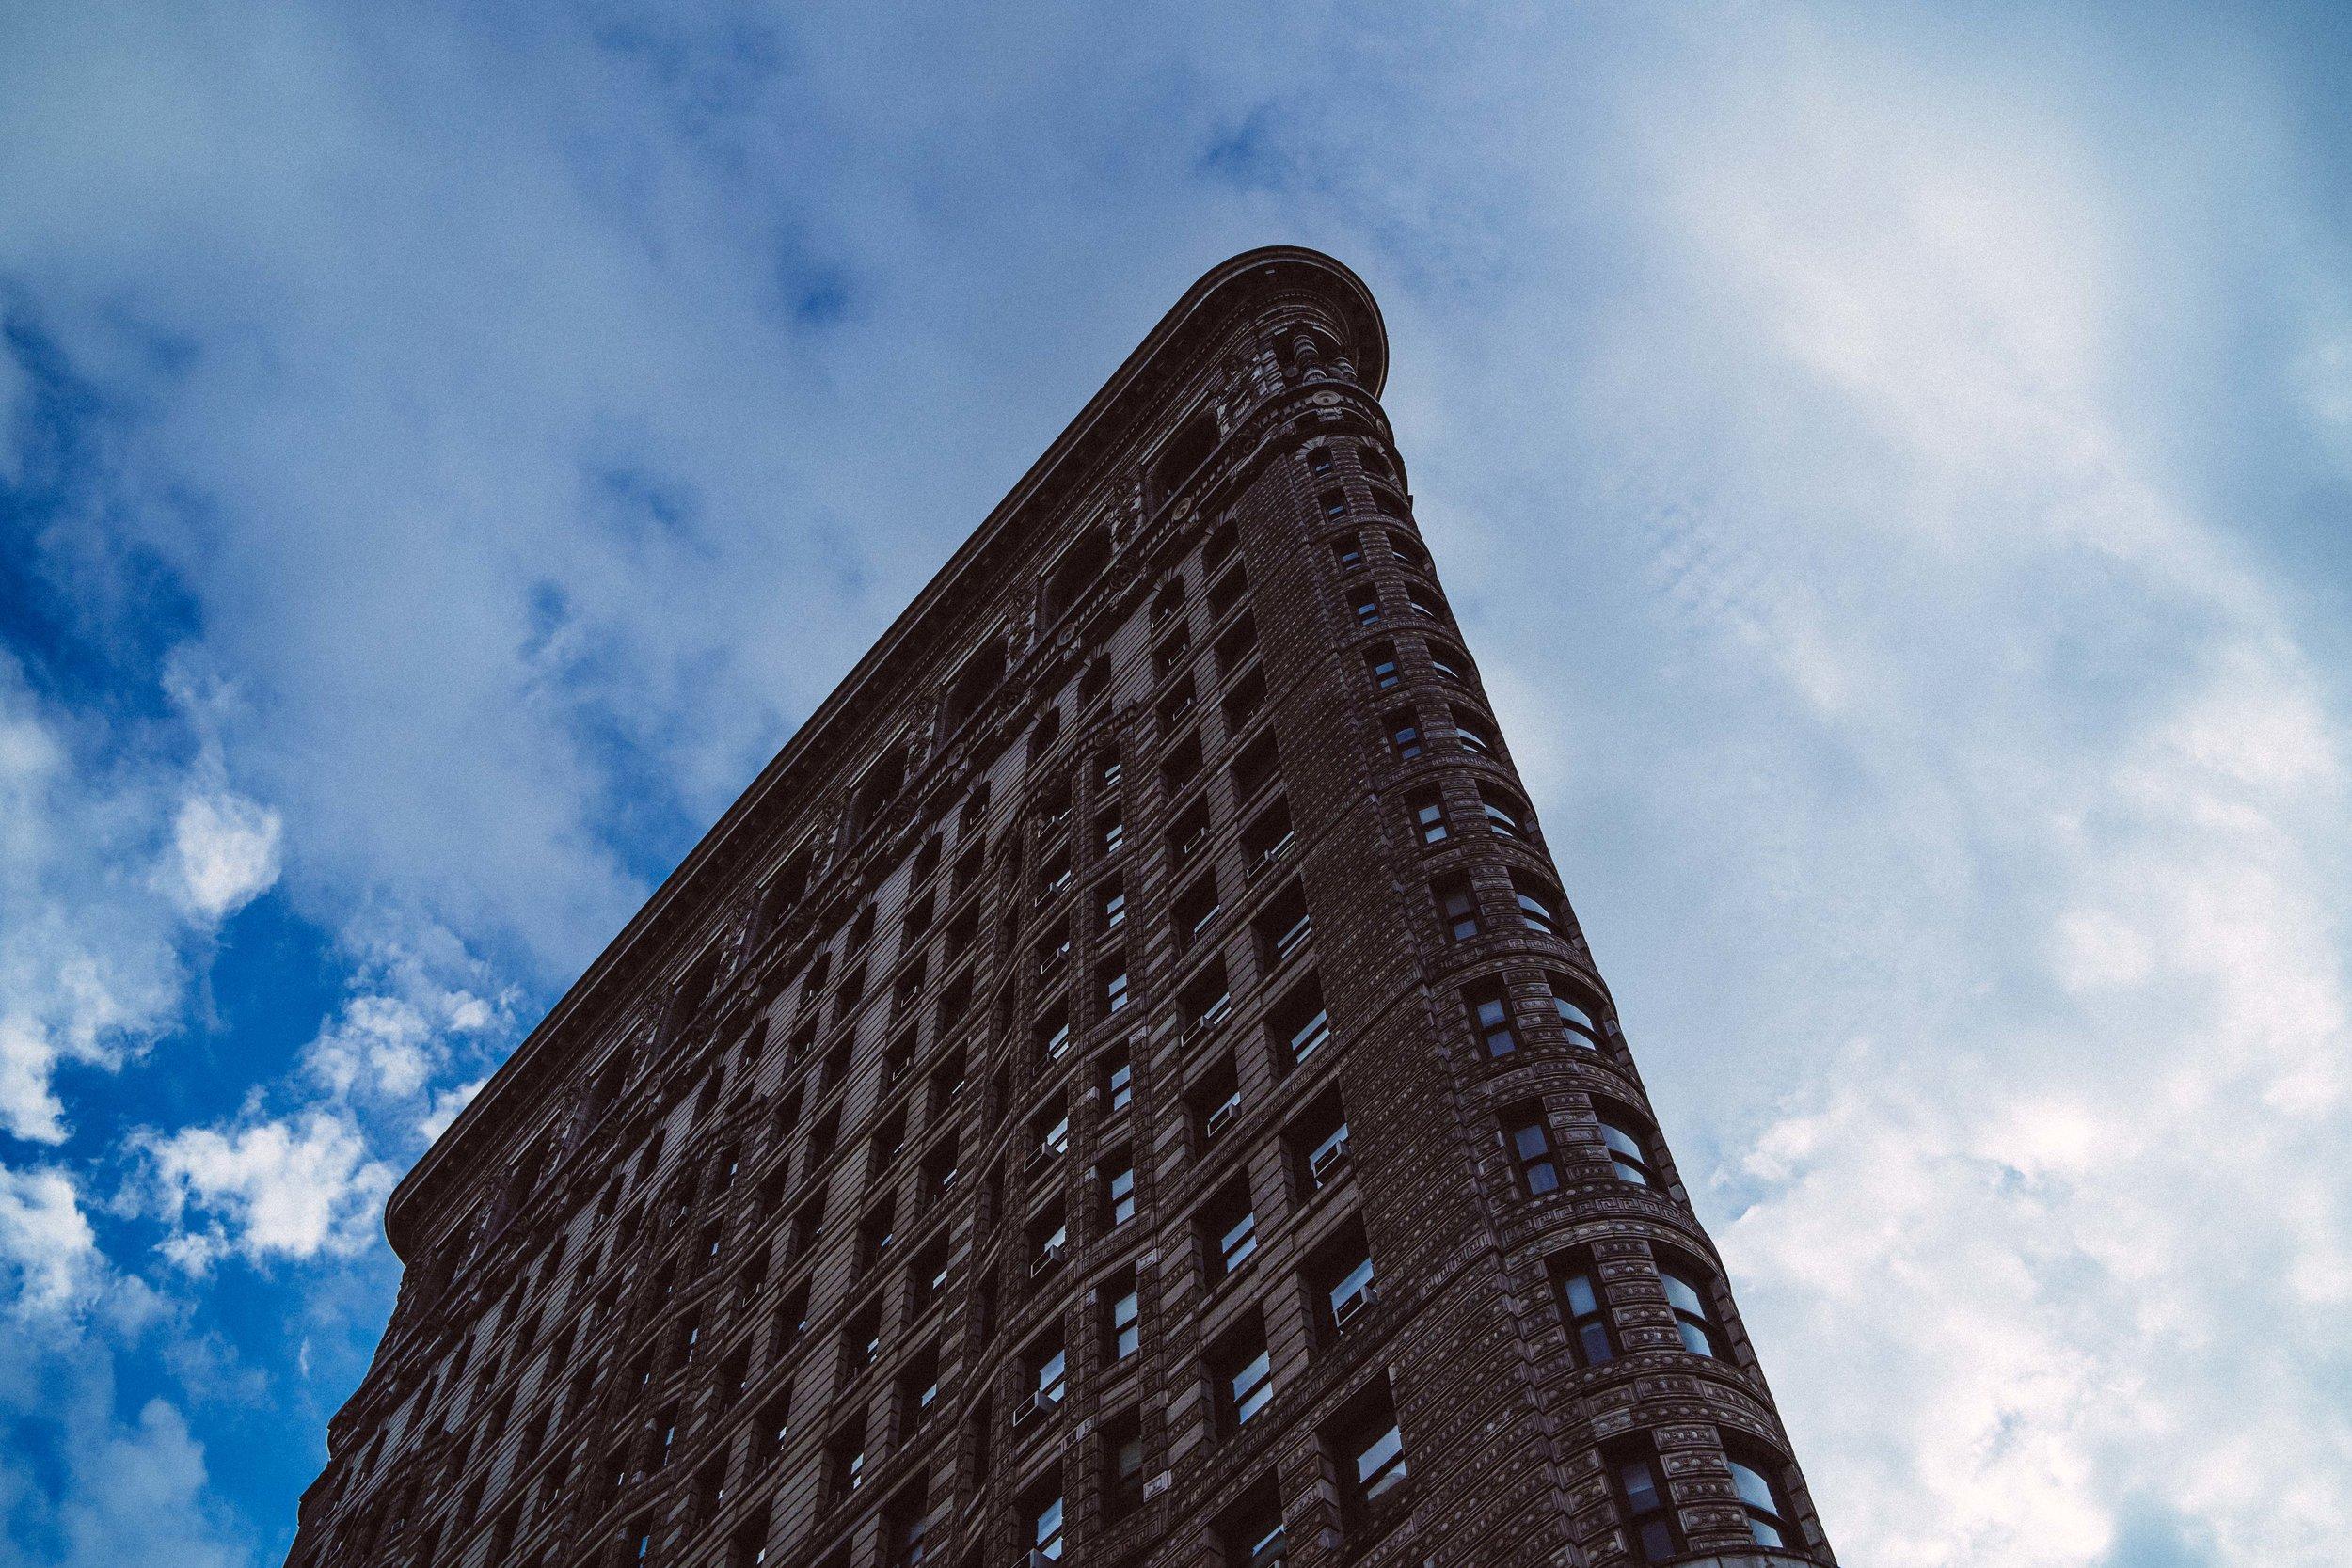 newyork-sony-102725.jpg